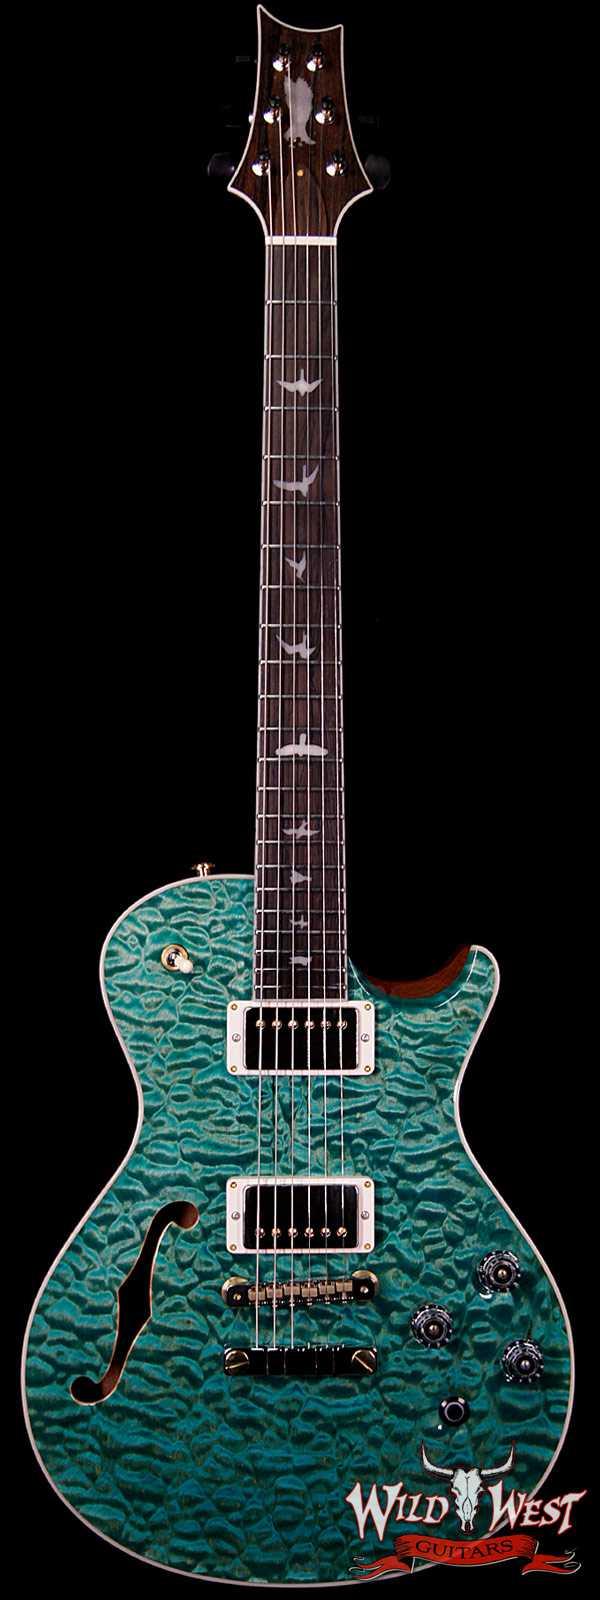 PRS Private Stock #7824 Singlecut McCarty 594 Semi-Hollow Quilt Top Brazilian Rosewood Fingerboard Bahamian Blue